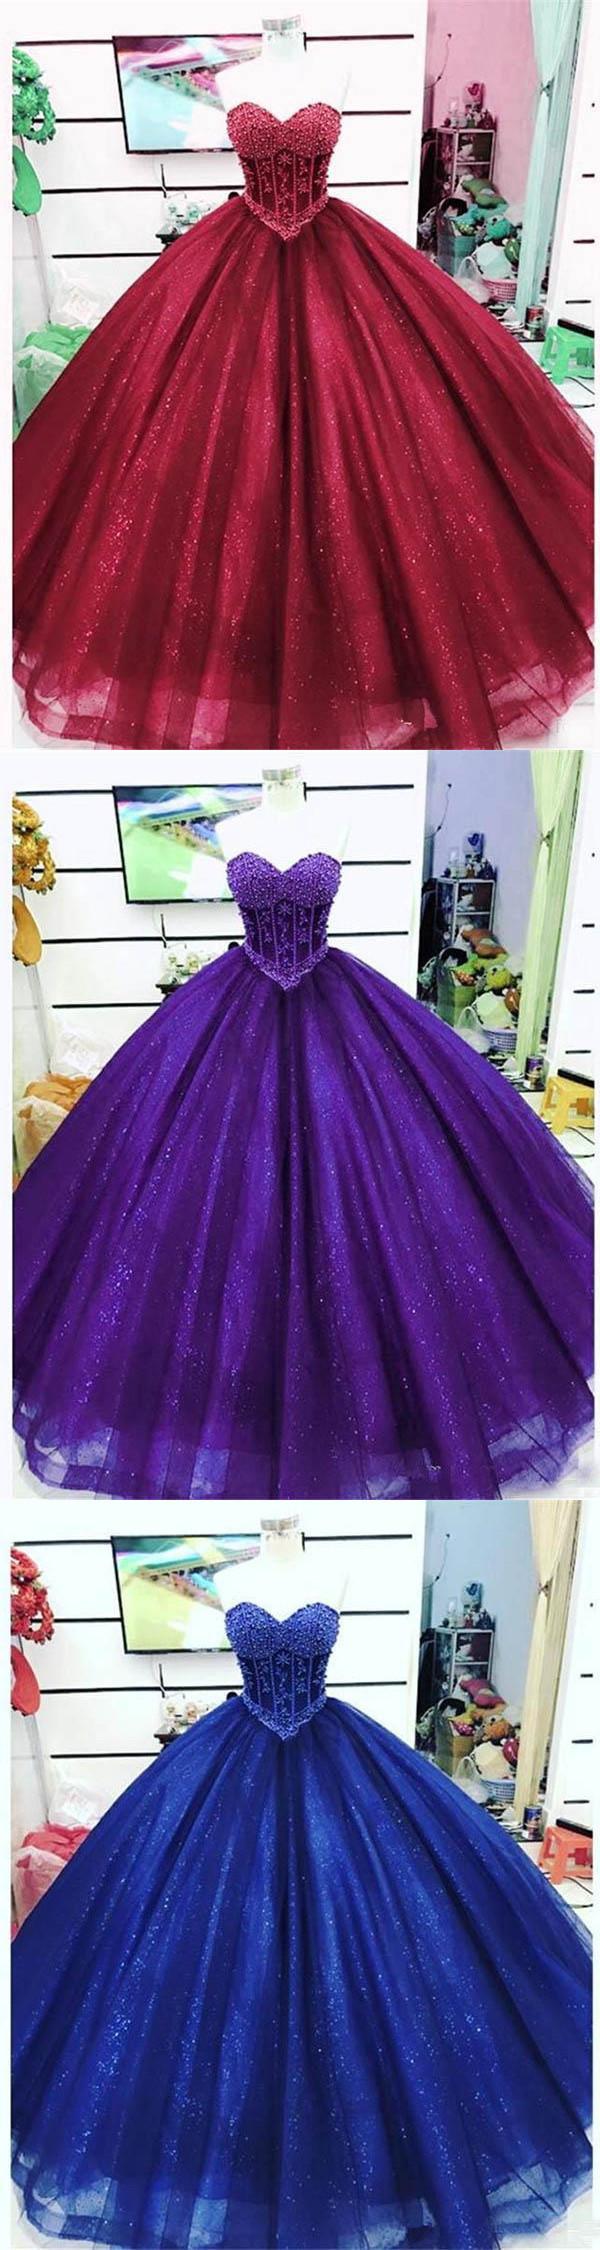 d044b57ebe7 Sparkly Burgundy Quinceanera Dresses Beaded Pearls Sweet 16 Dress vestidos  de